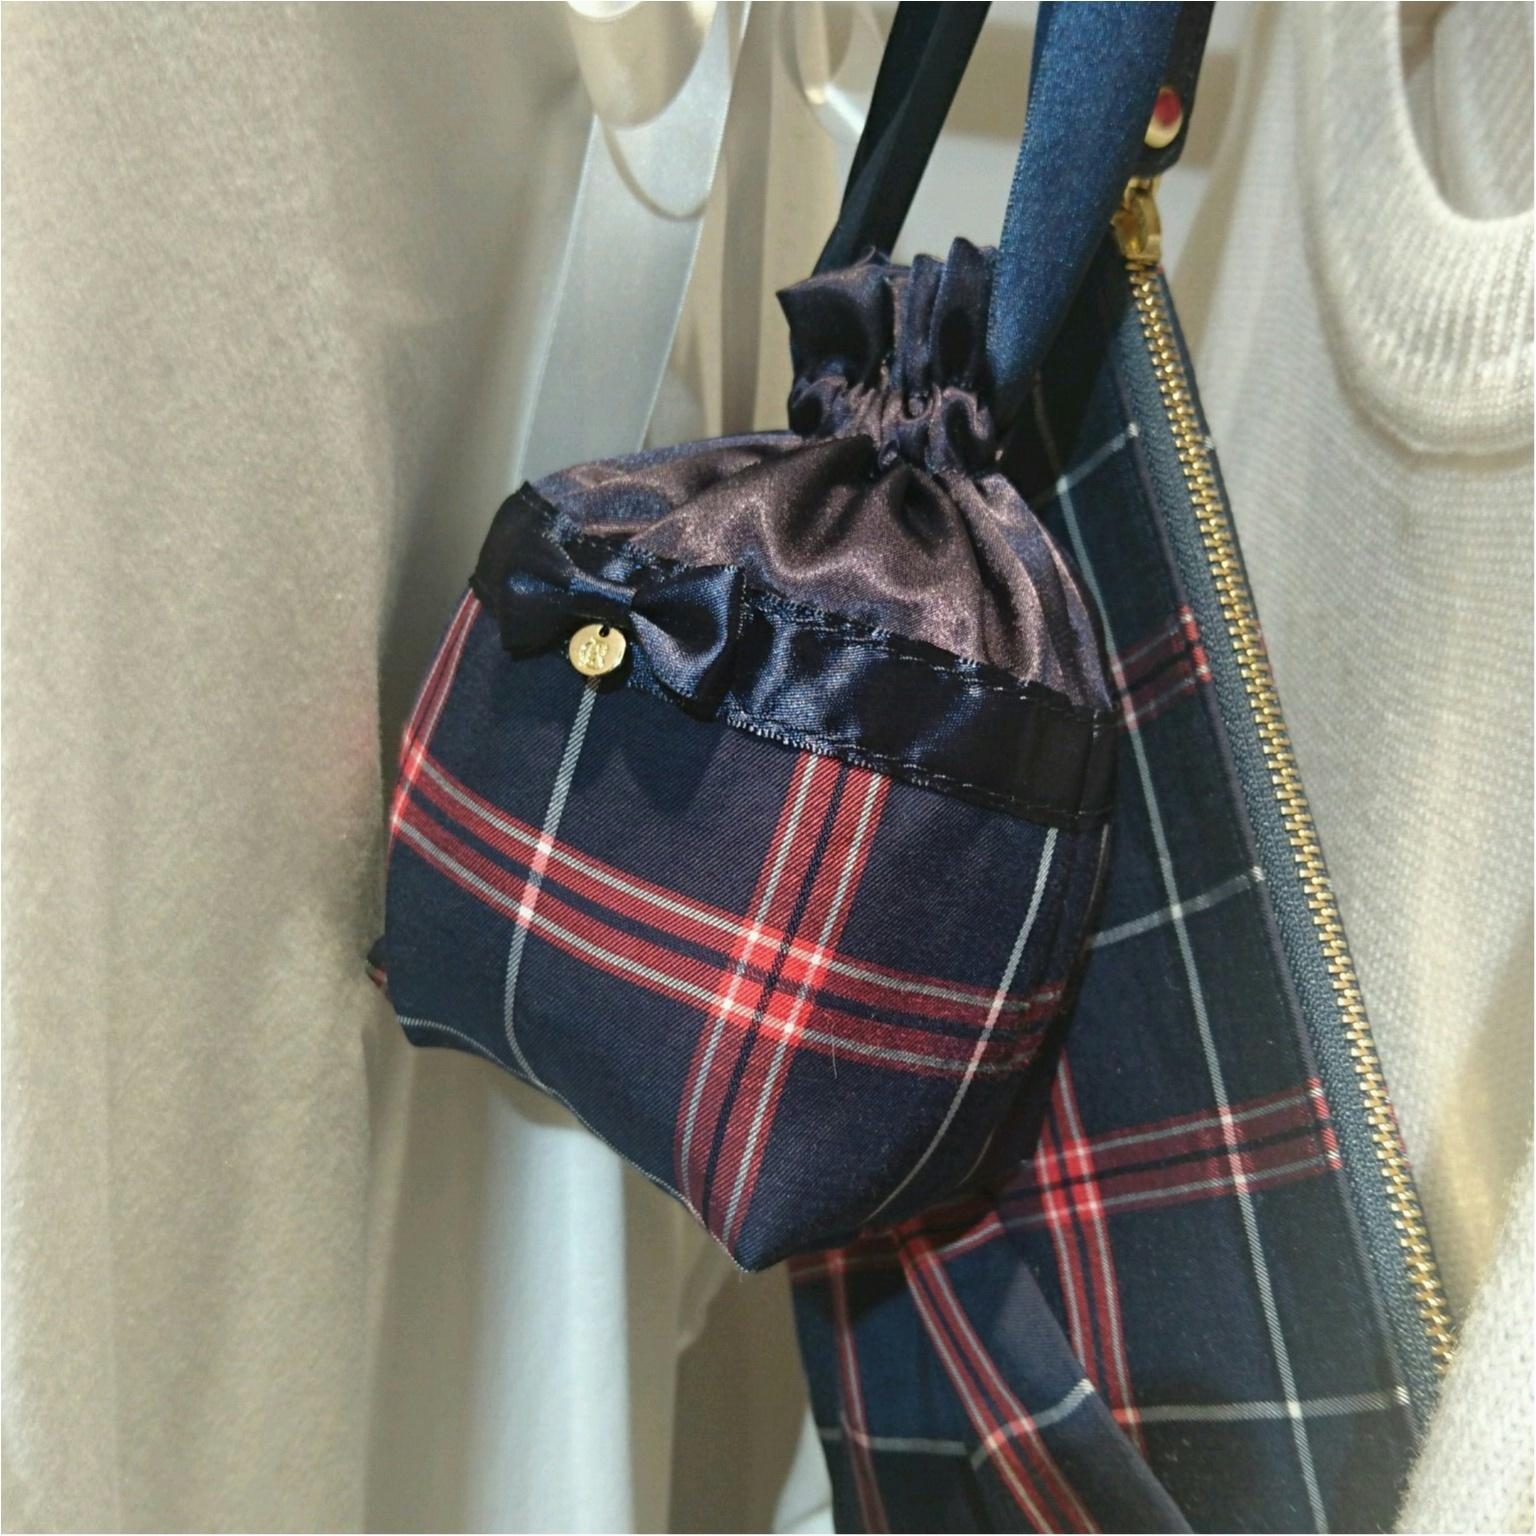 【BLUE LABEL(ブルーレーベル)】2018春夏展示会に行ってきました!注目の商品は…?_4_3